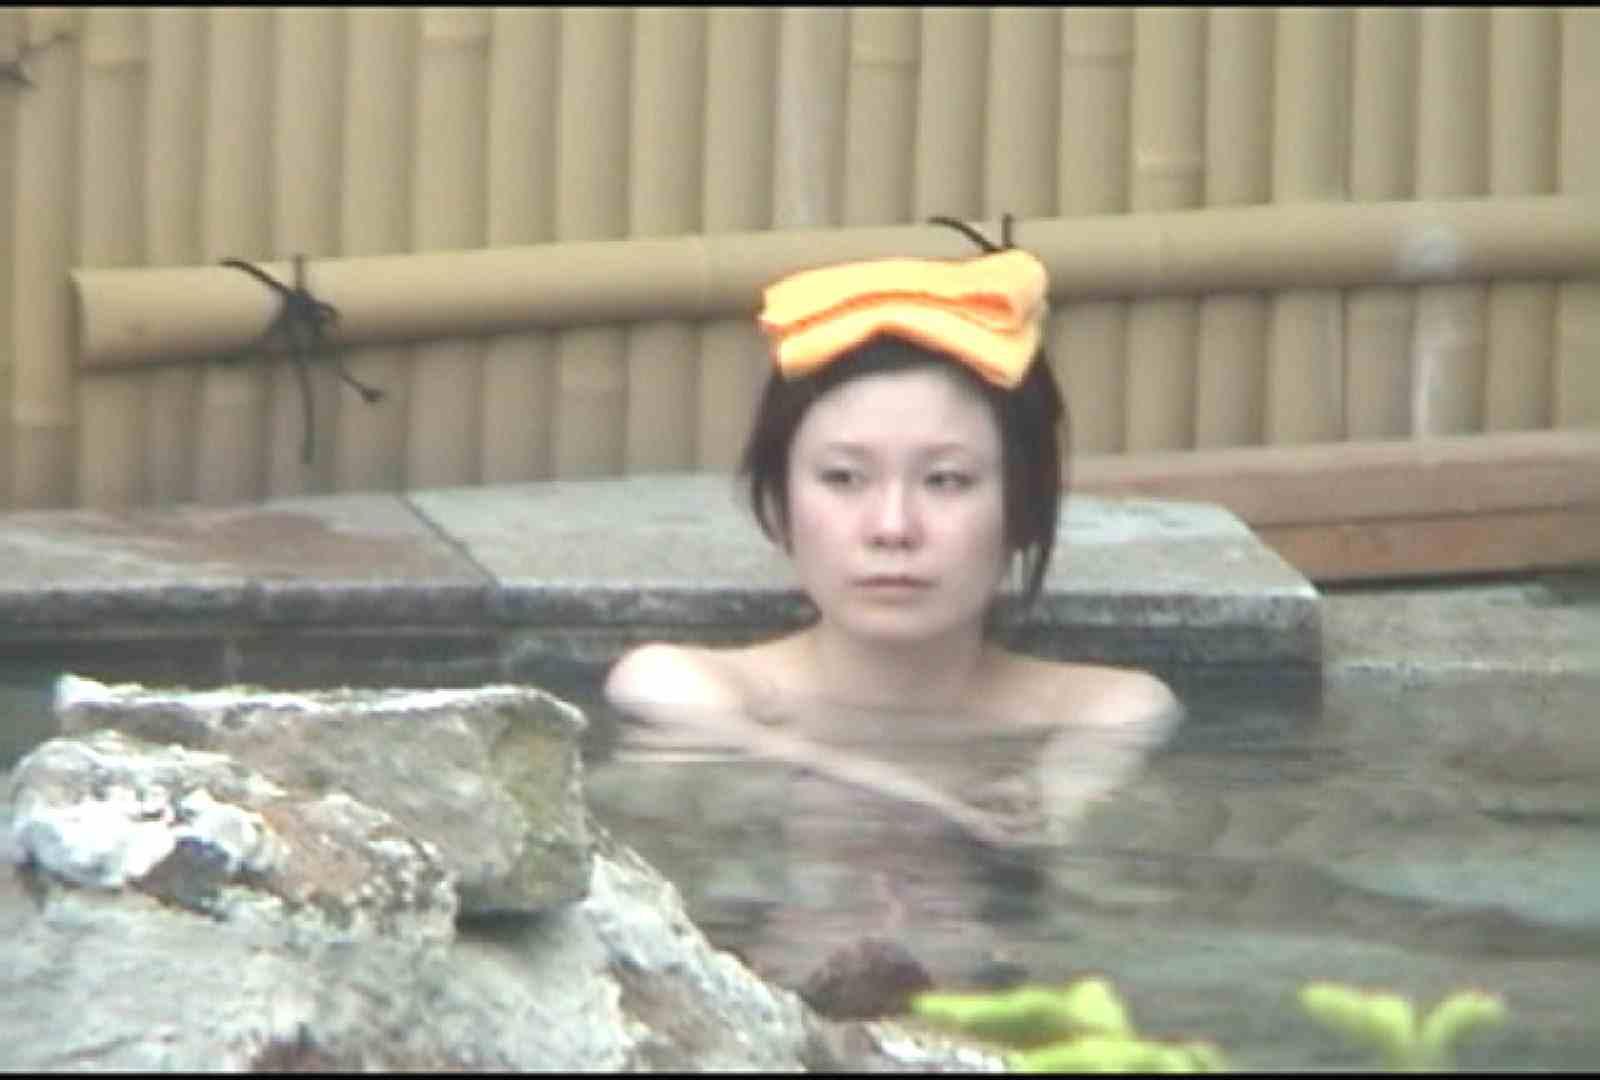 Aquaな露天風呂Vol.177 盗撮師作品  102pic 33